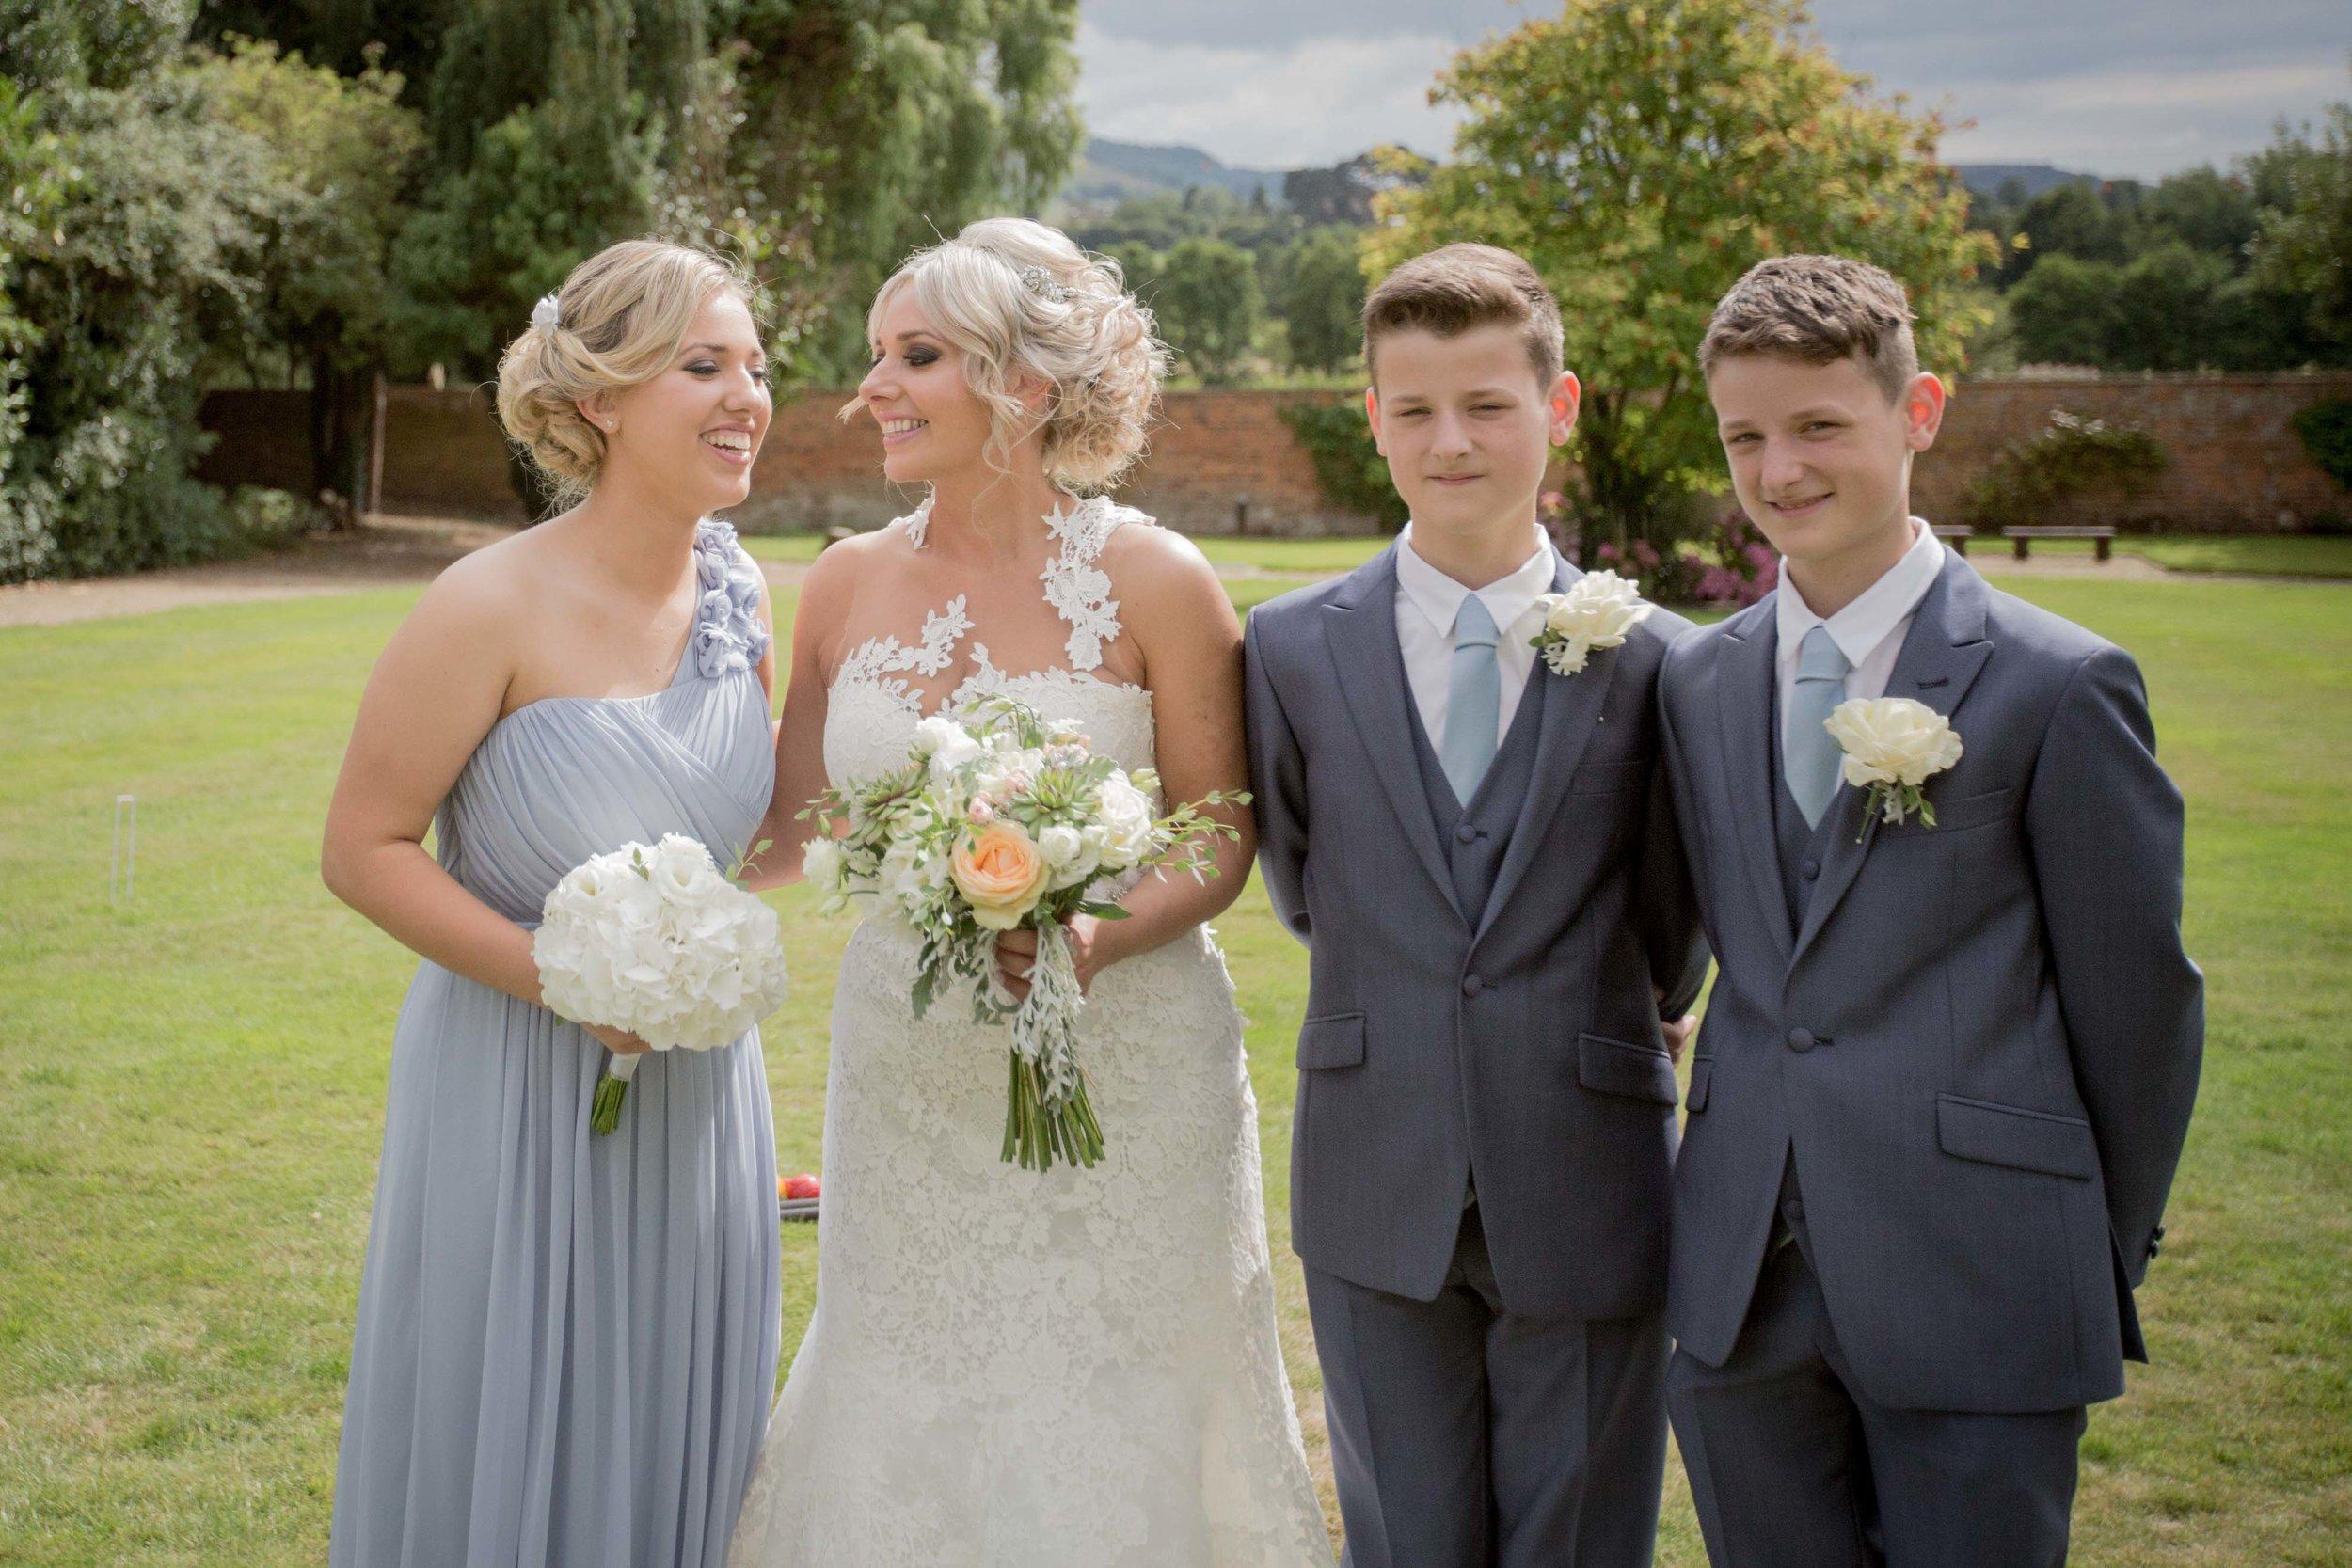 cotswold-wedding-photography-at-stonehouse-court-hotel-natalia-smith-photography-gloucestershire-wedding-photographer-51.jpg